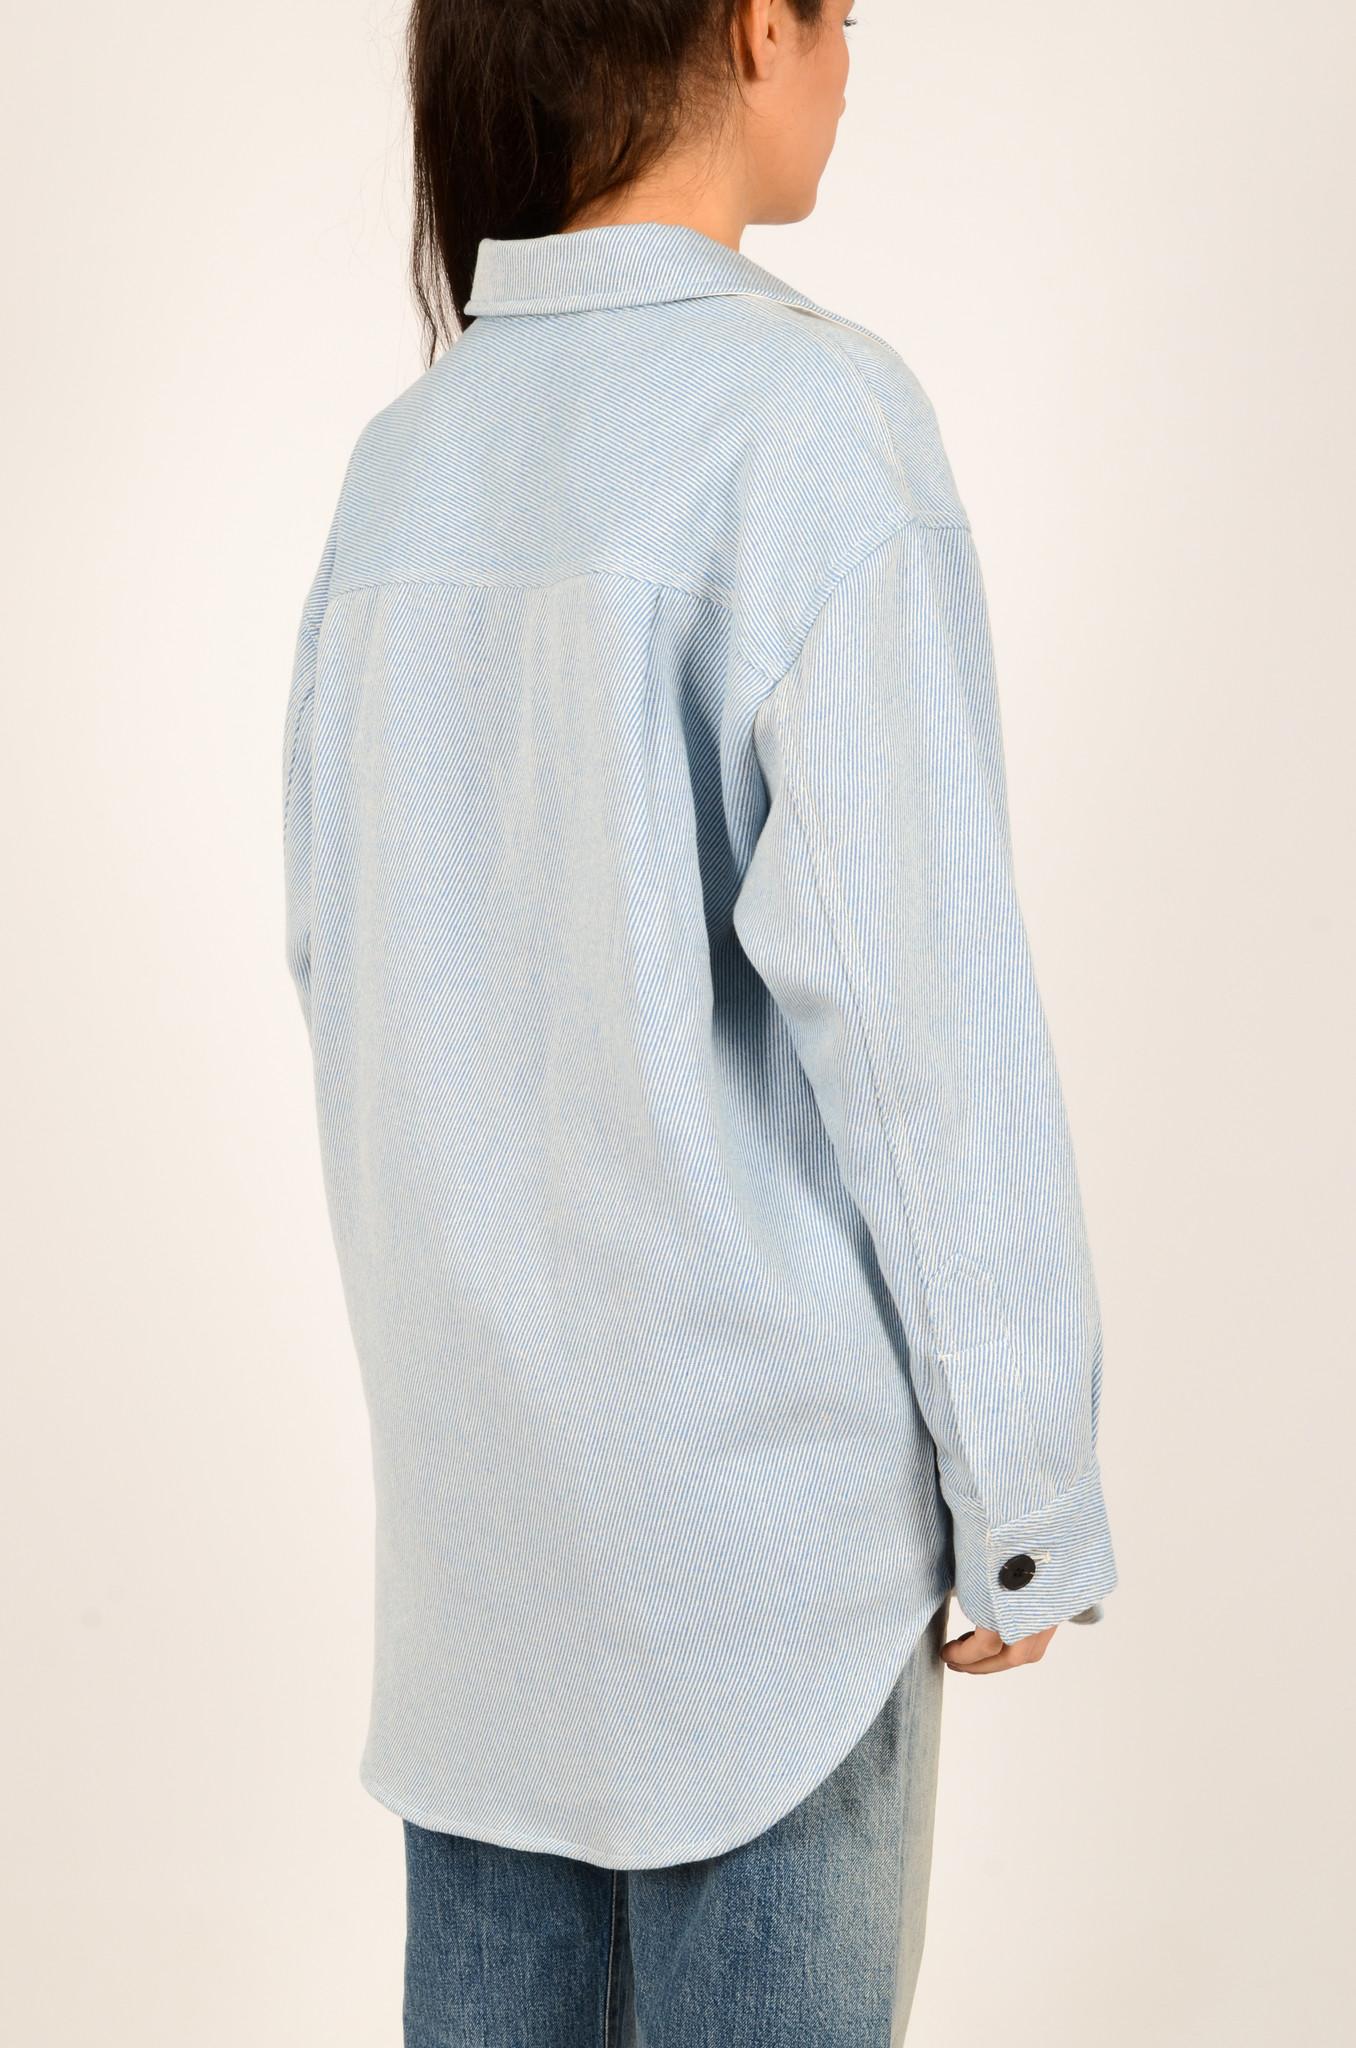 PALERMO SHIRT COAT IN DUSTY BLUE-4